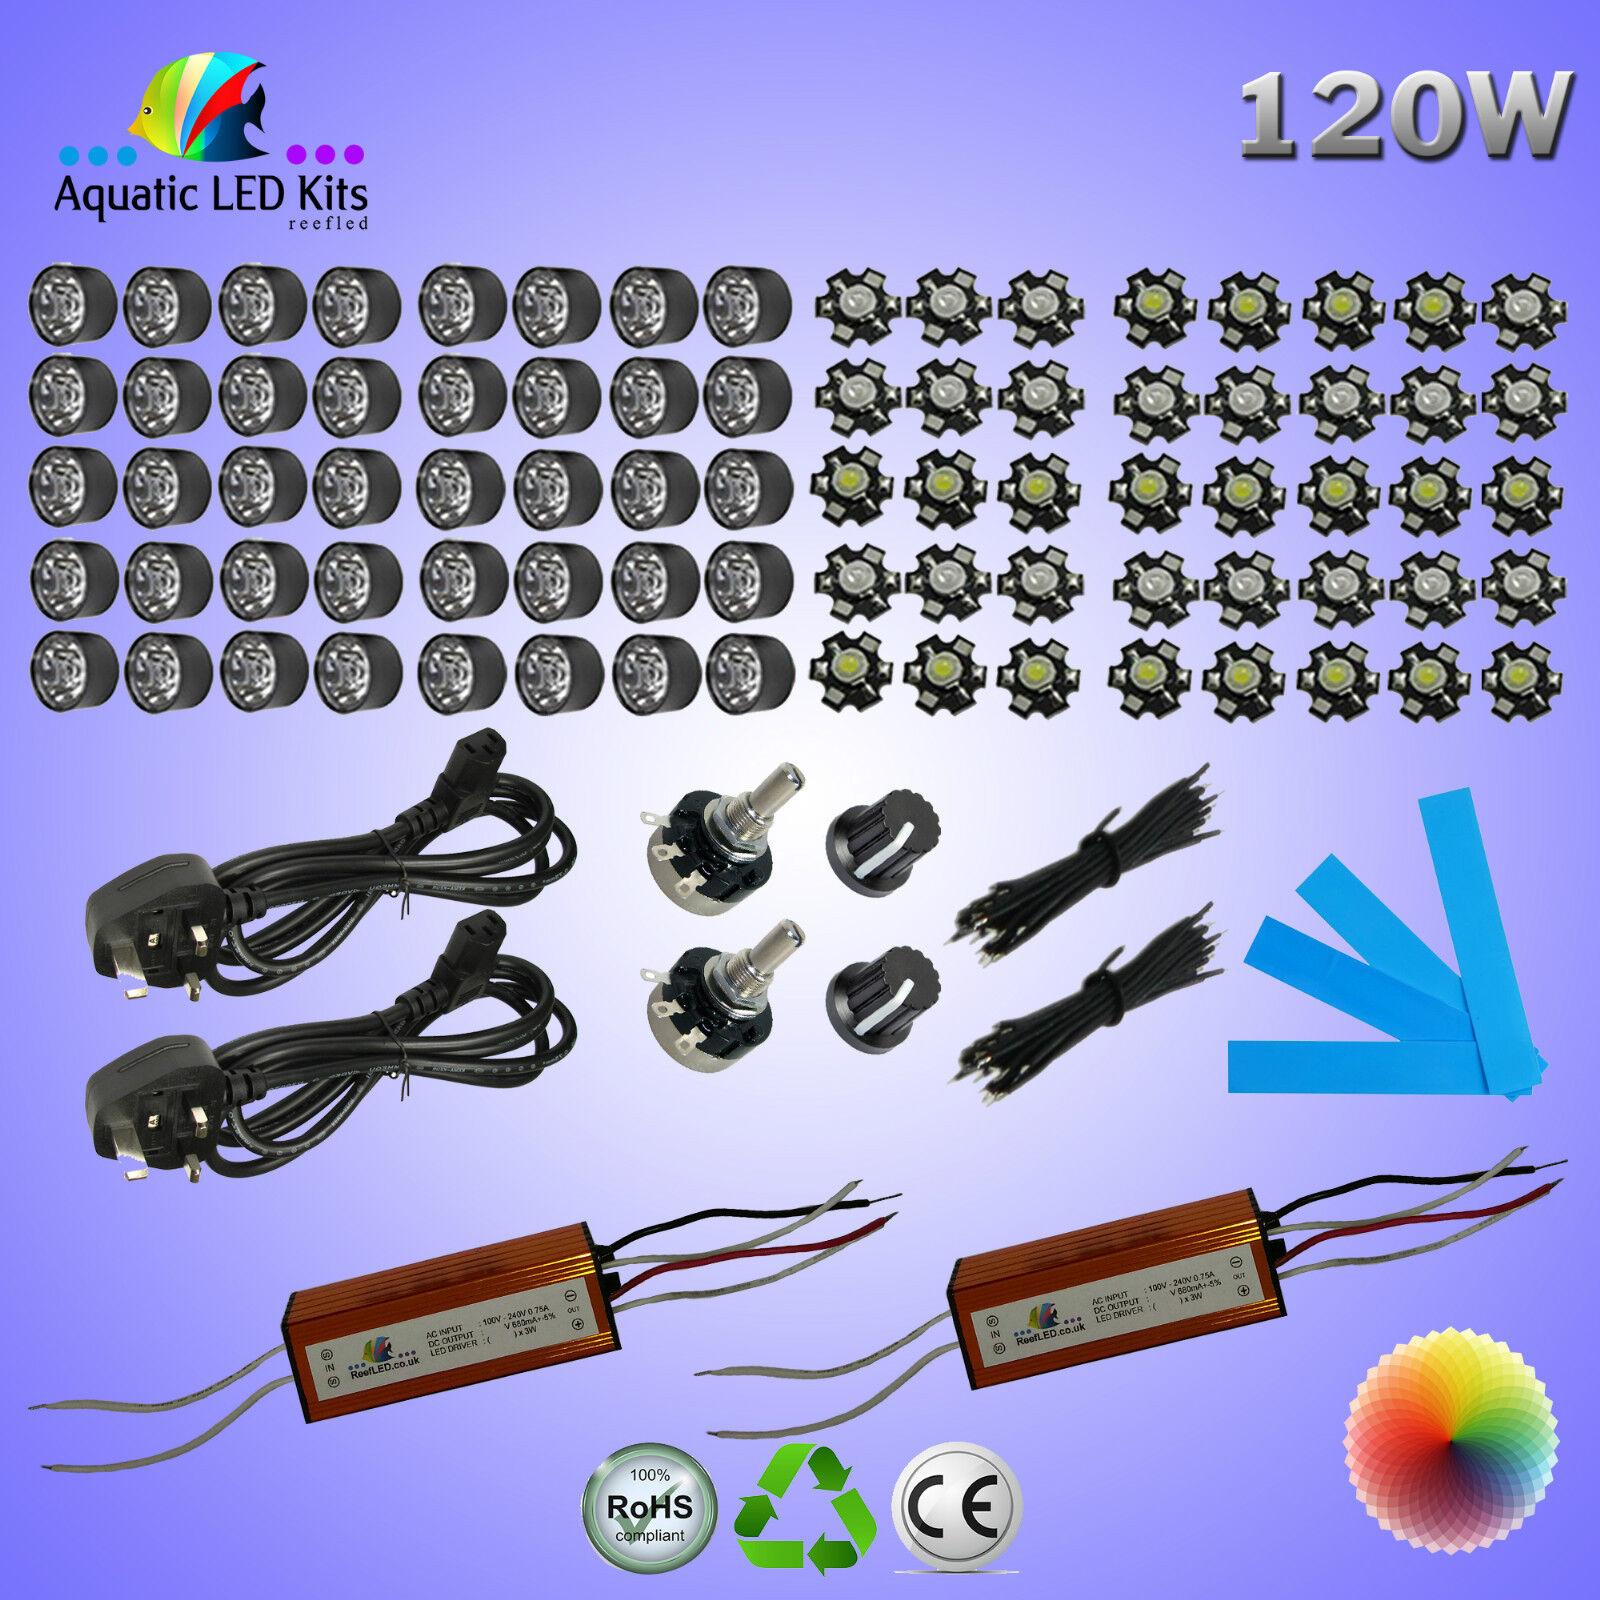 Fai-da-te Dimming Bridgelux ACQUARIO LUCE LED KIT 36W, 60W, 72W, 90W, 120W,